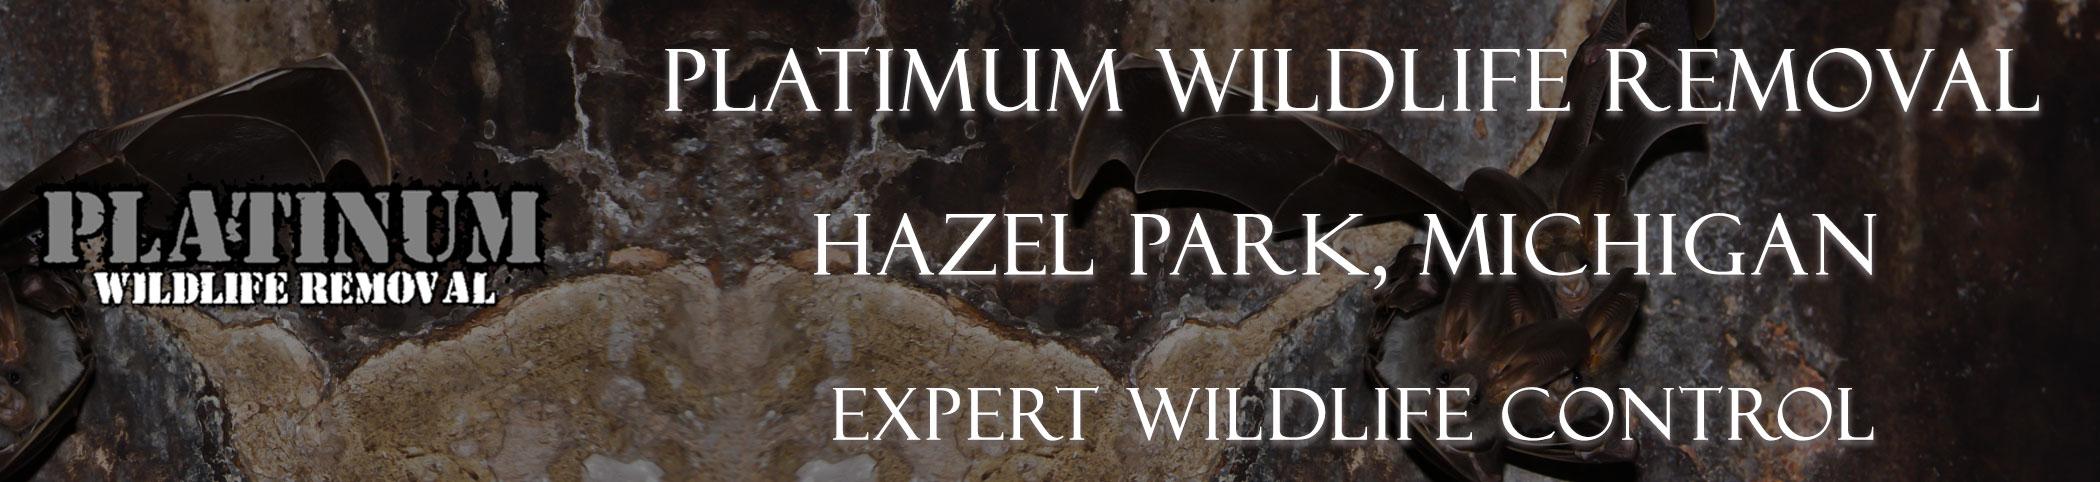 Hazel-Park-Platinum-Wildlife-Removal-michgan